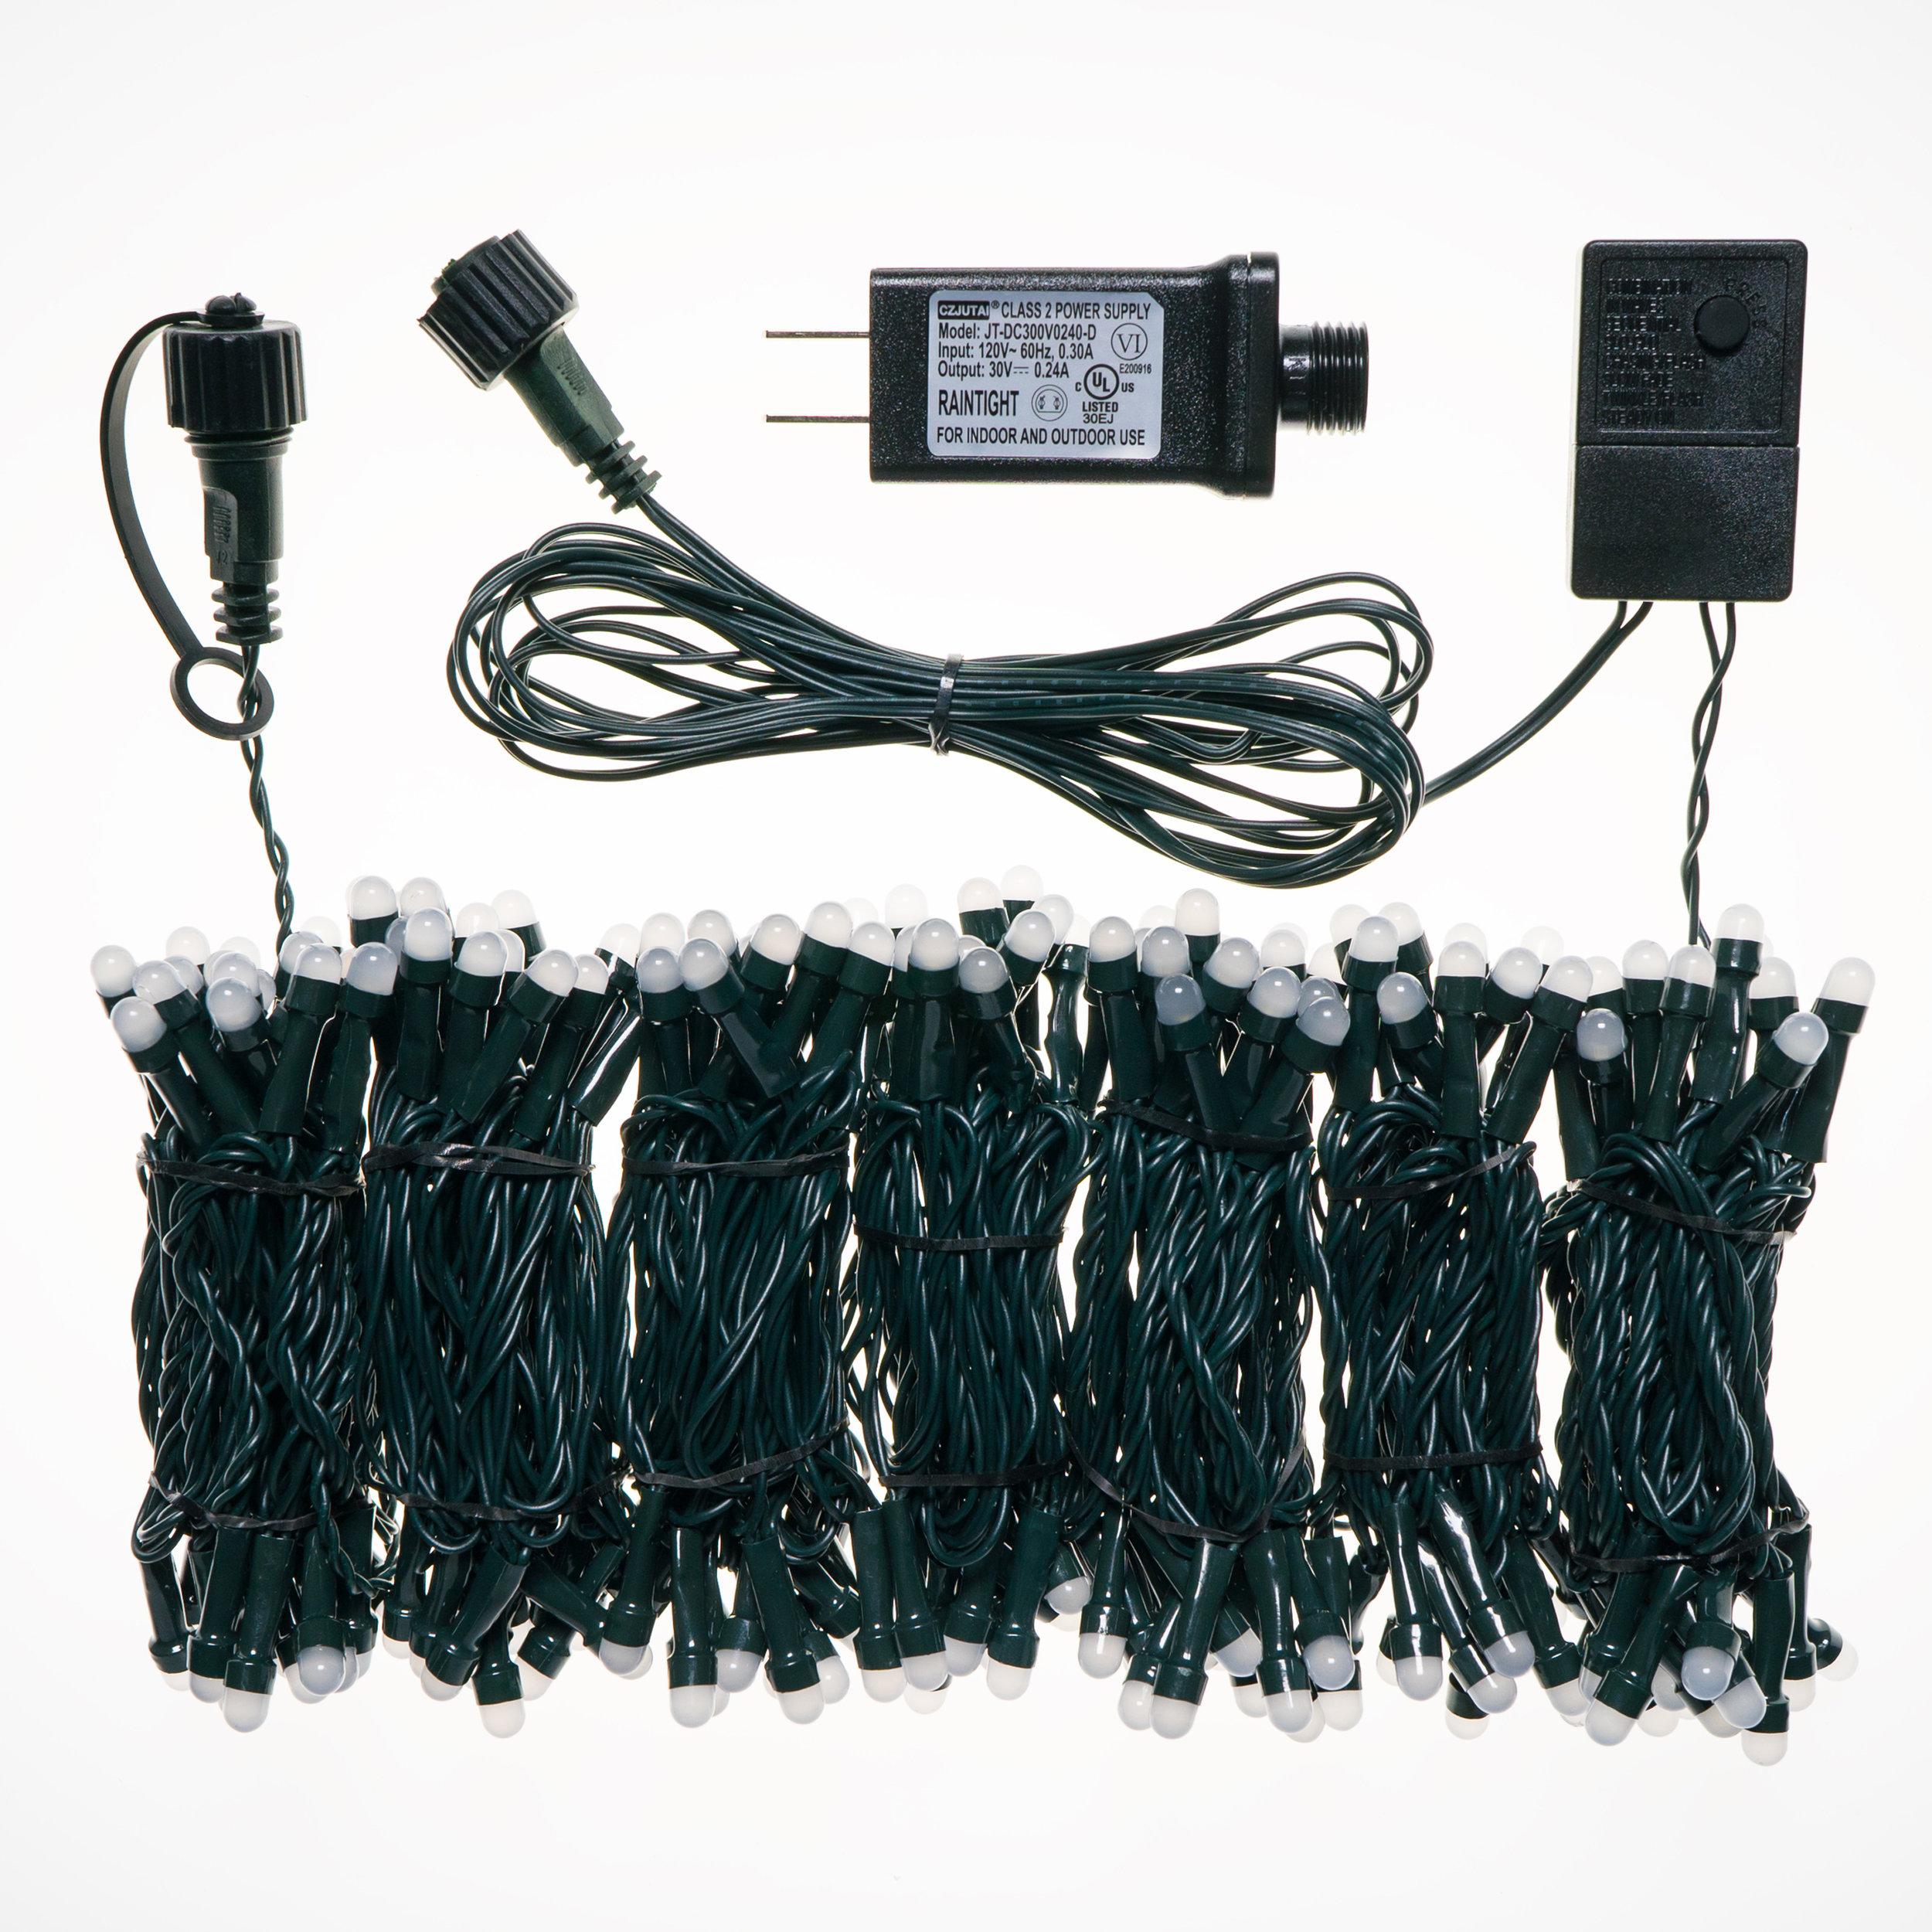 Novolink SL-200-8-BLE-WW String, Transformer and Controller